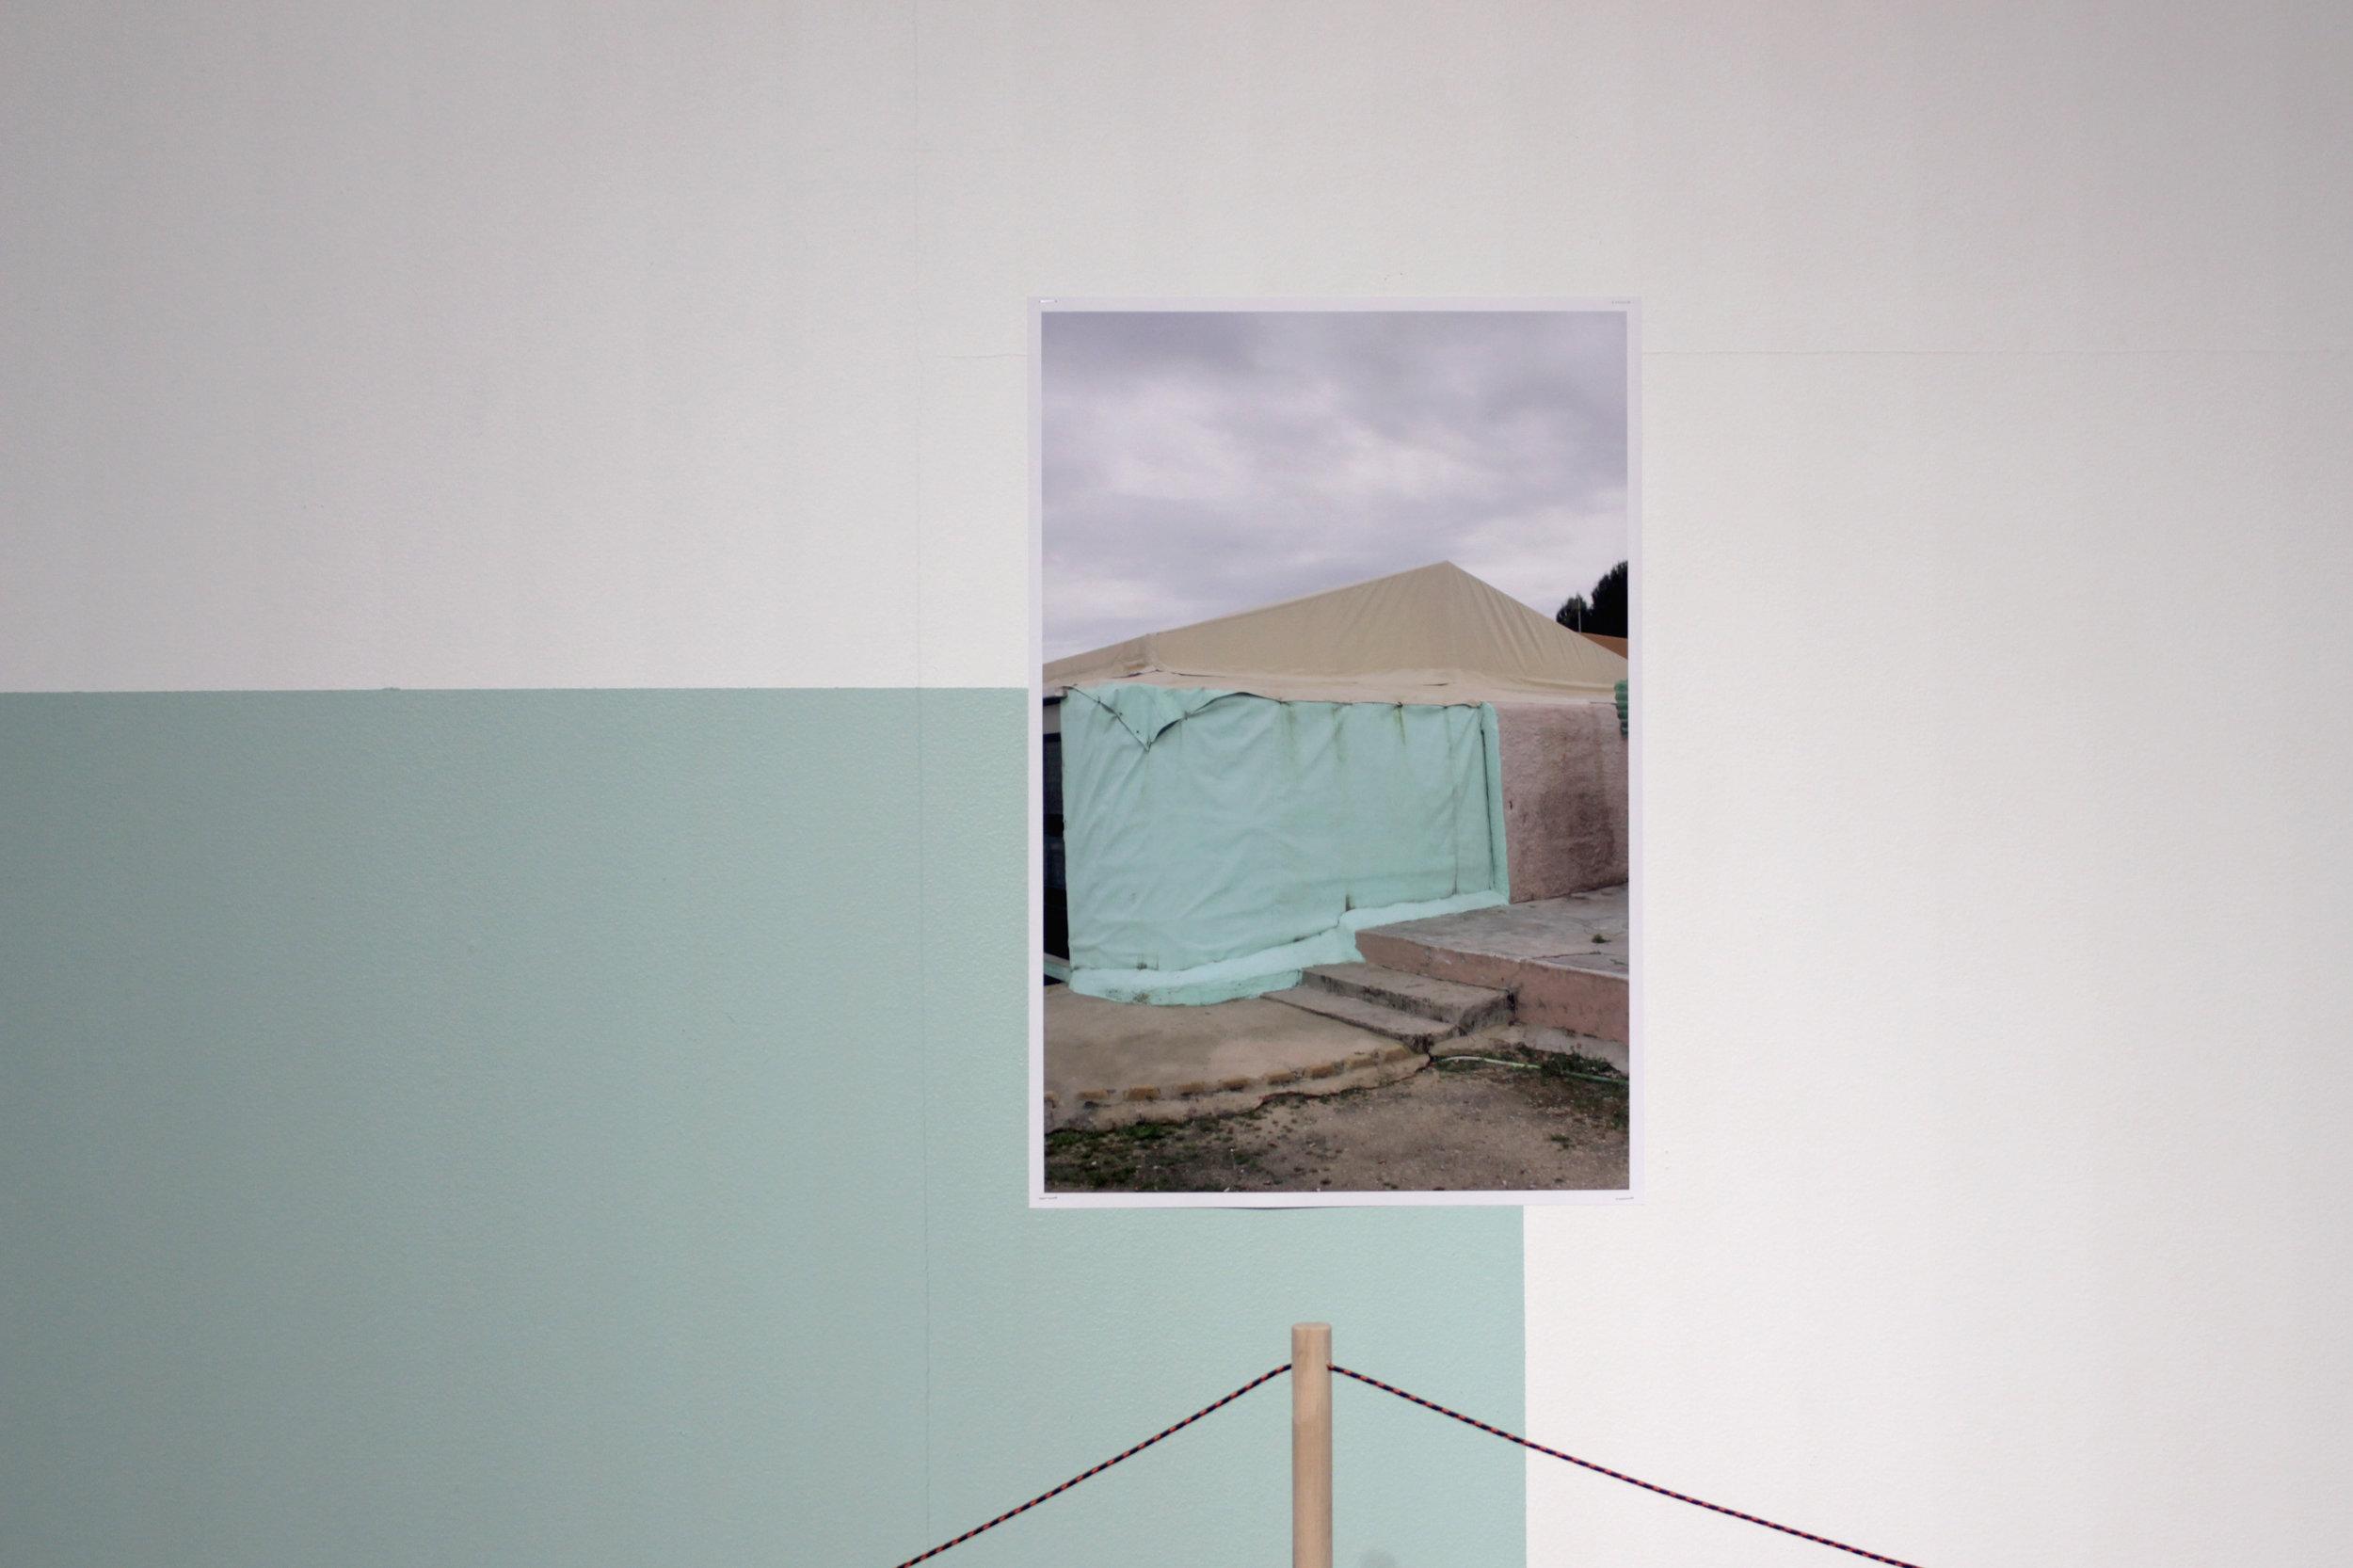 Untitled , 2018, 52 cmx 38 cm , (digital print).  Untitled , 2018, dimensions variable, (wood, rope). Foto: Audun Alvestad